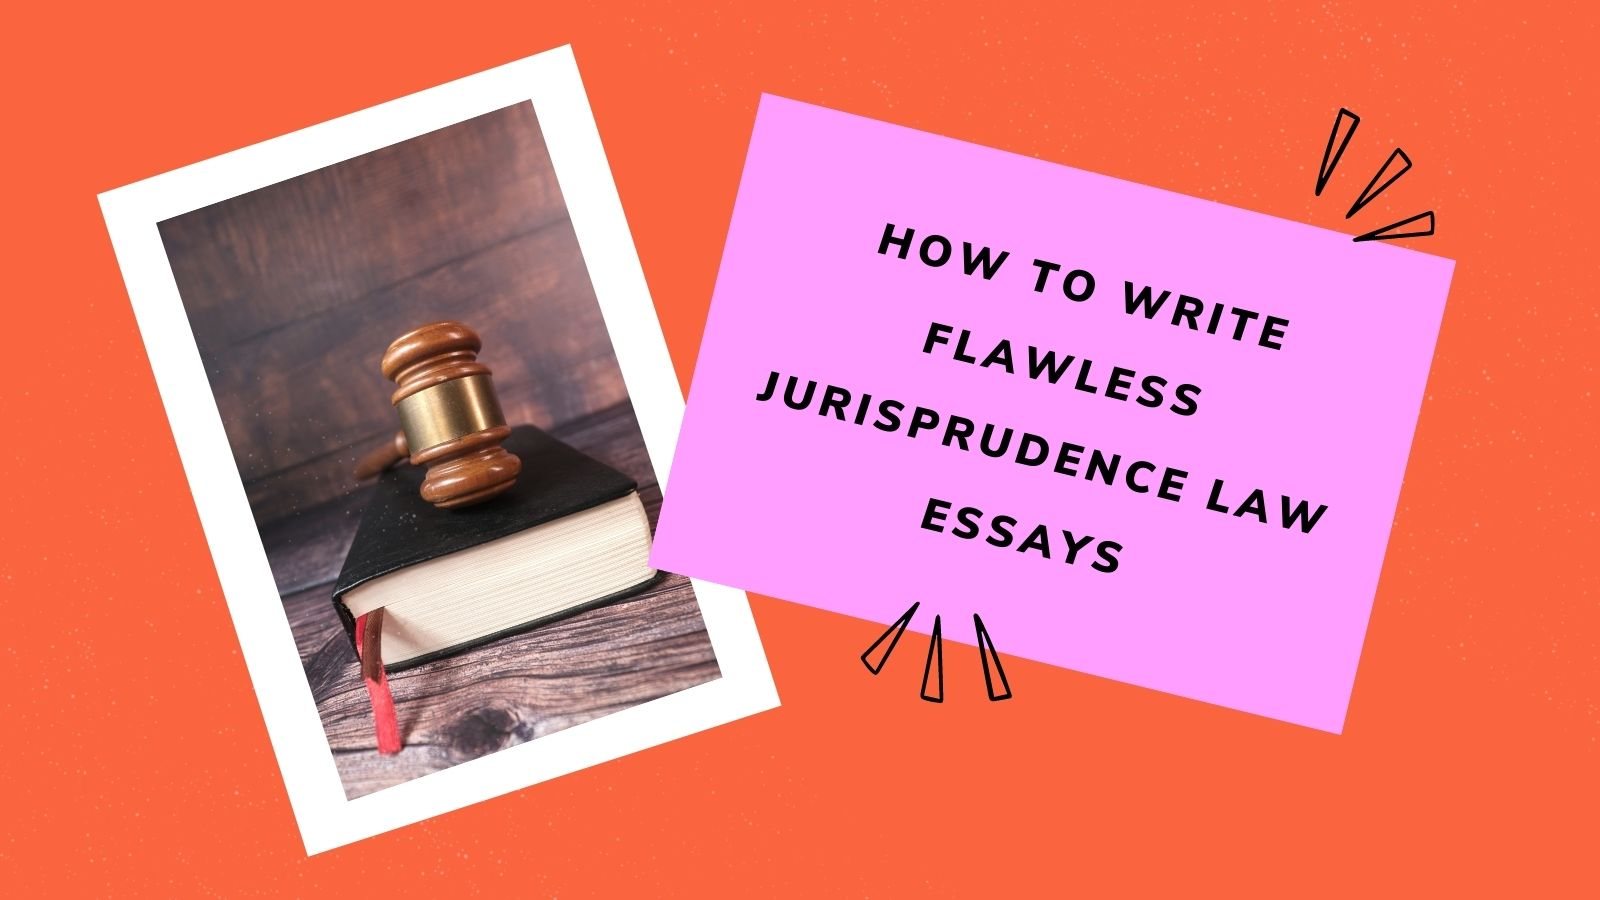 jurisprudence law essay